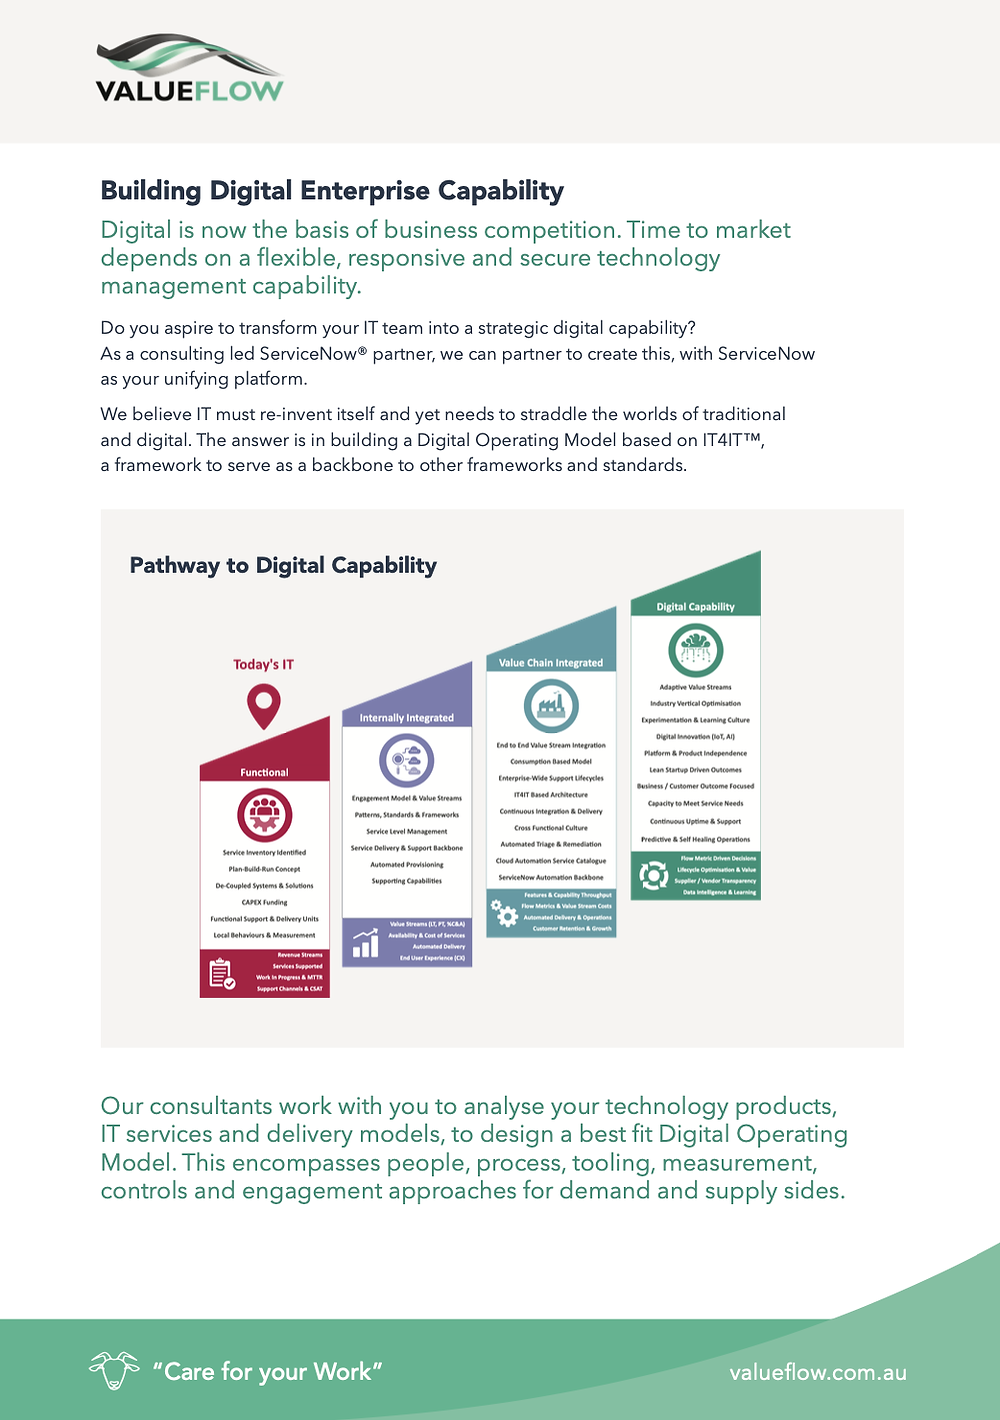 Building digital enterprise capability brochure screenshot